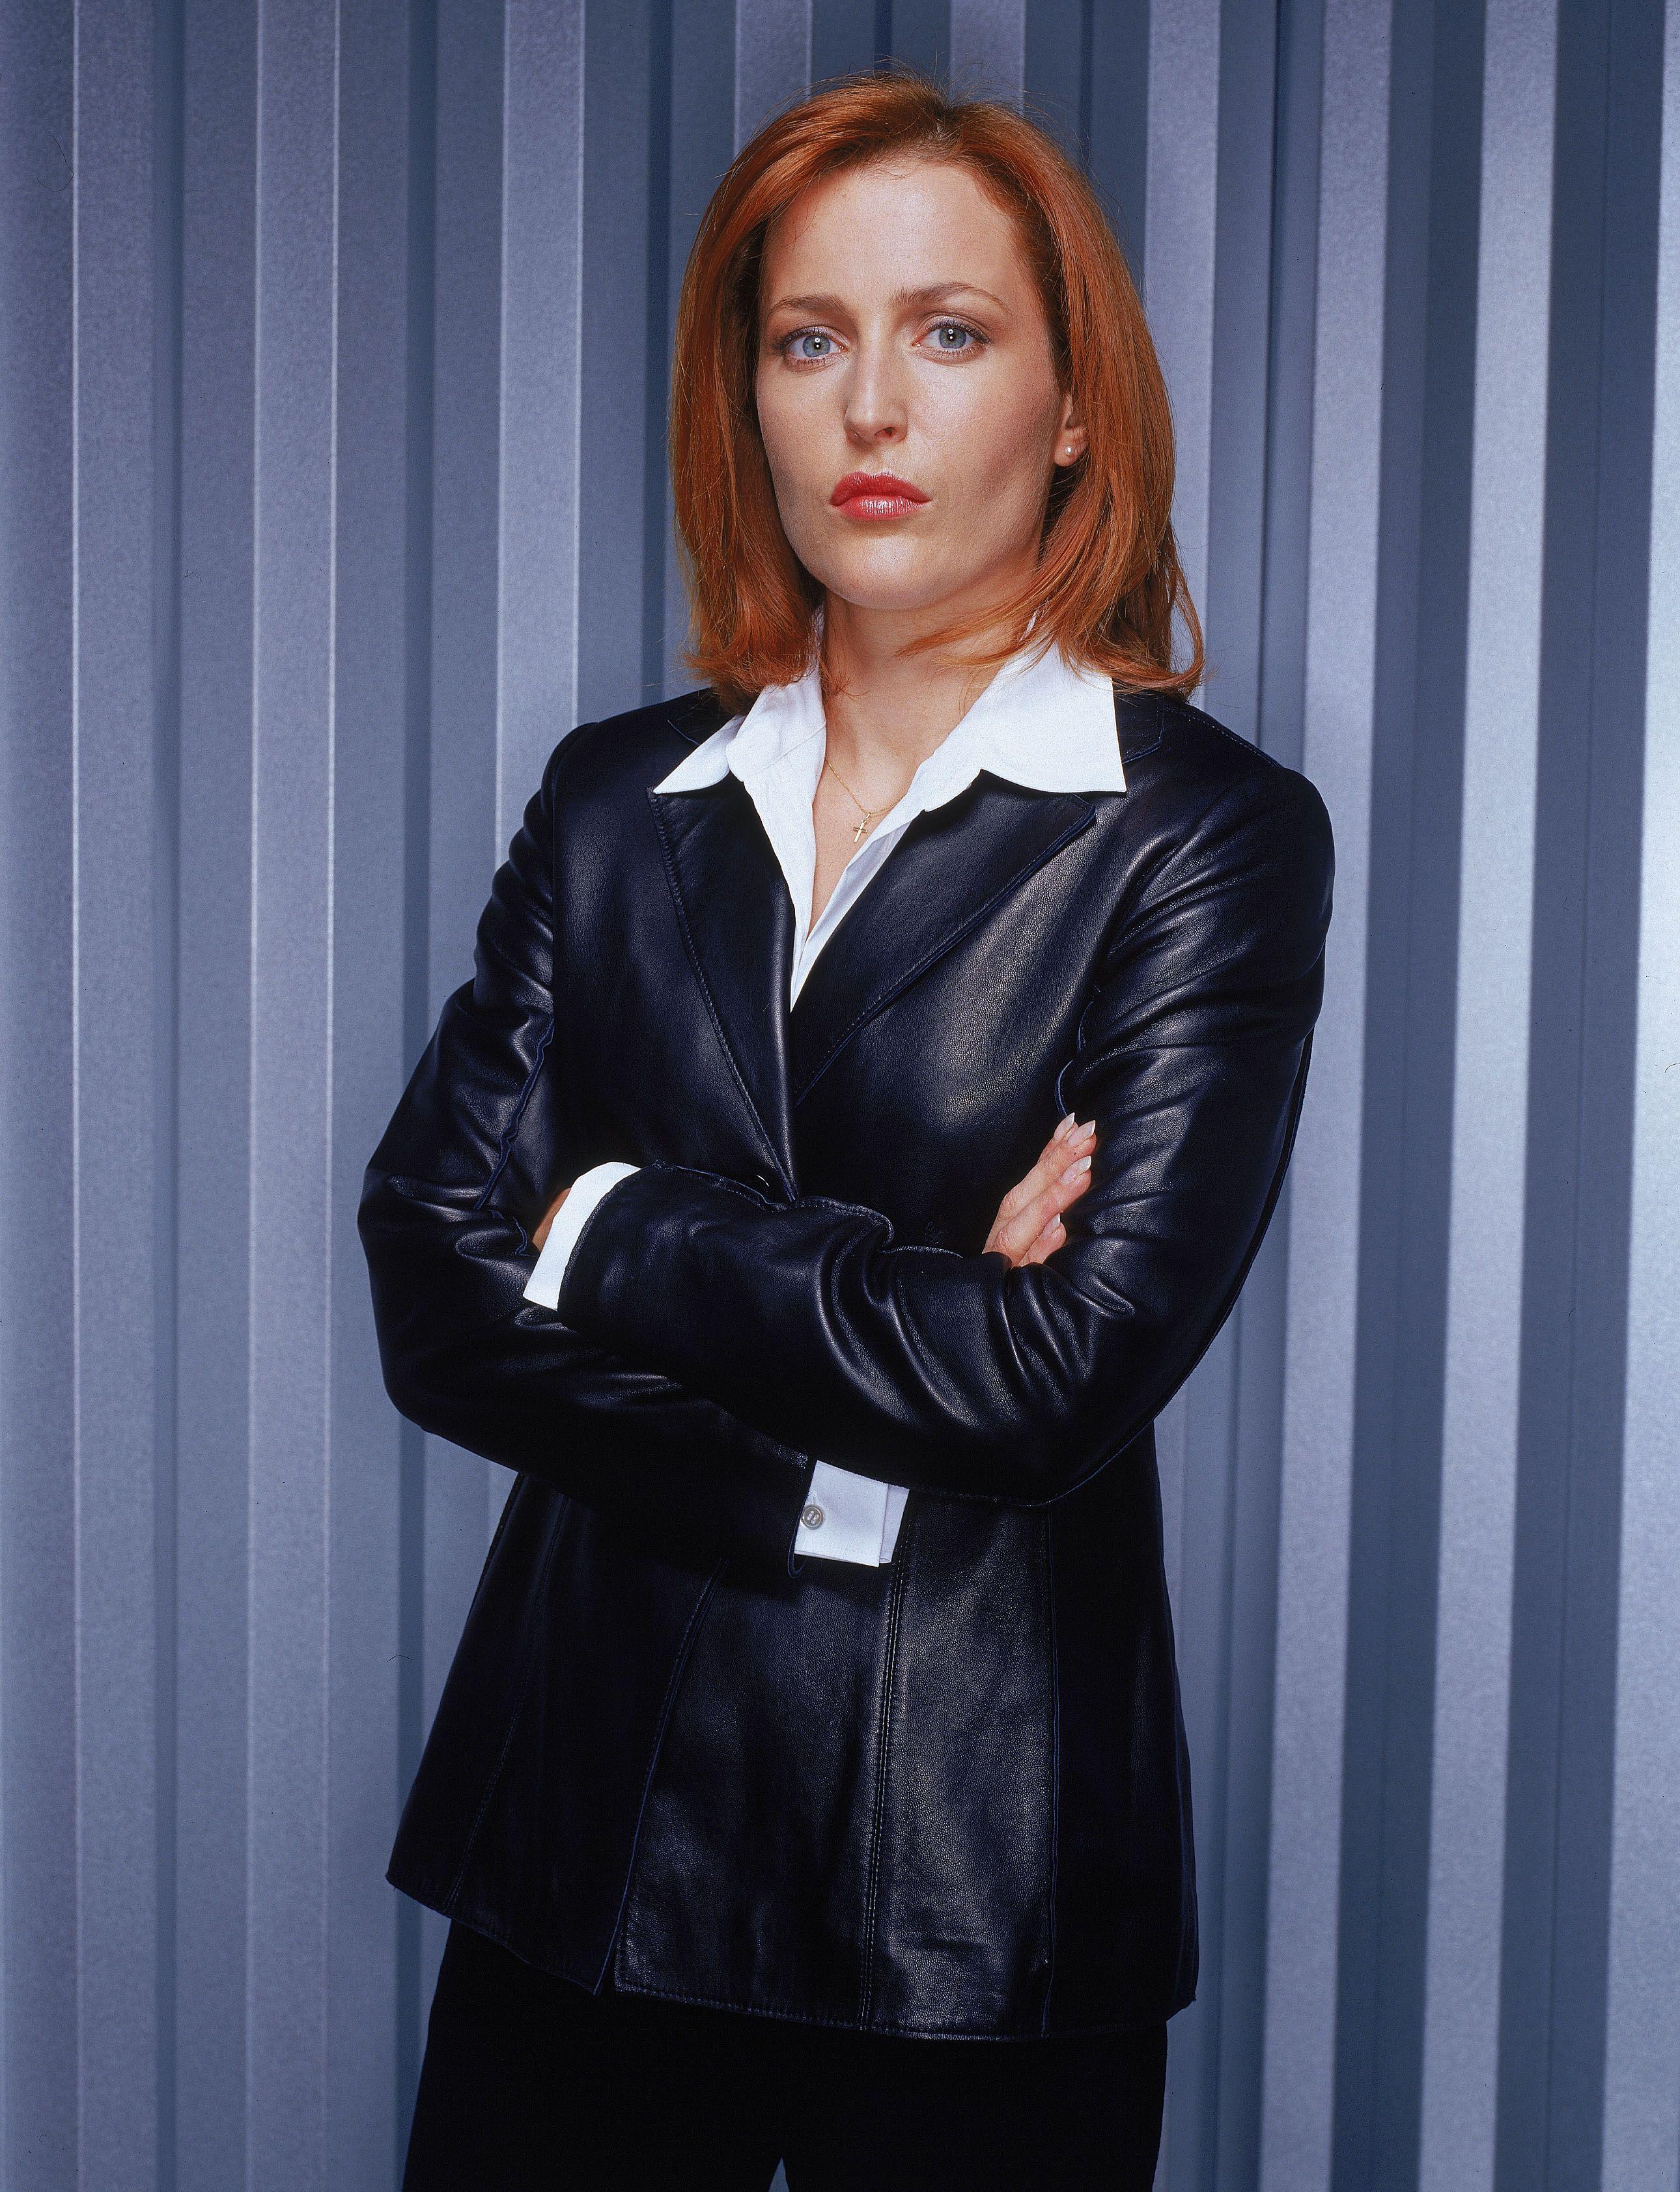 The X-Files Gillian Anderson